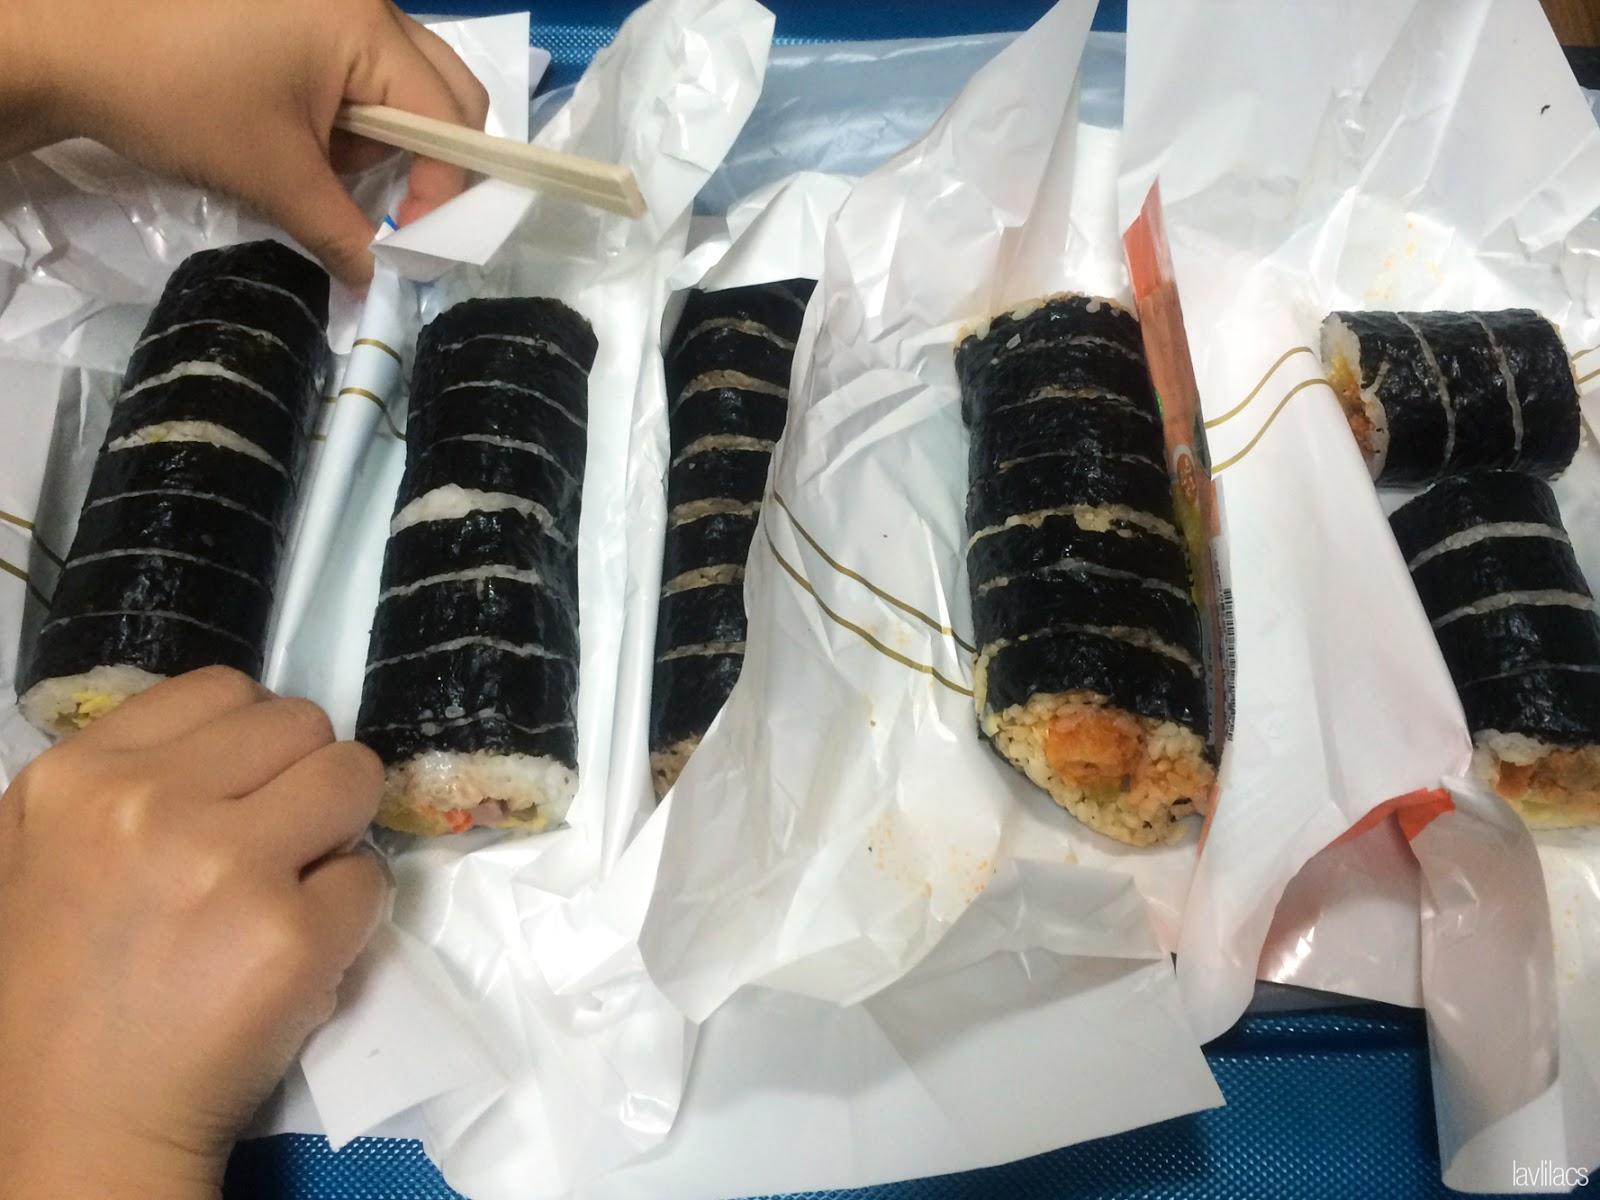 Seoul, Korea - Summer Study Abroad 2014 - Midnight snacking on convenience store kimbap